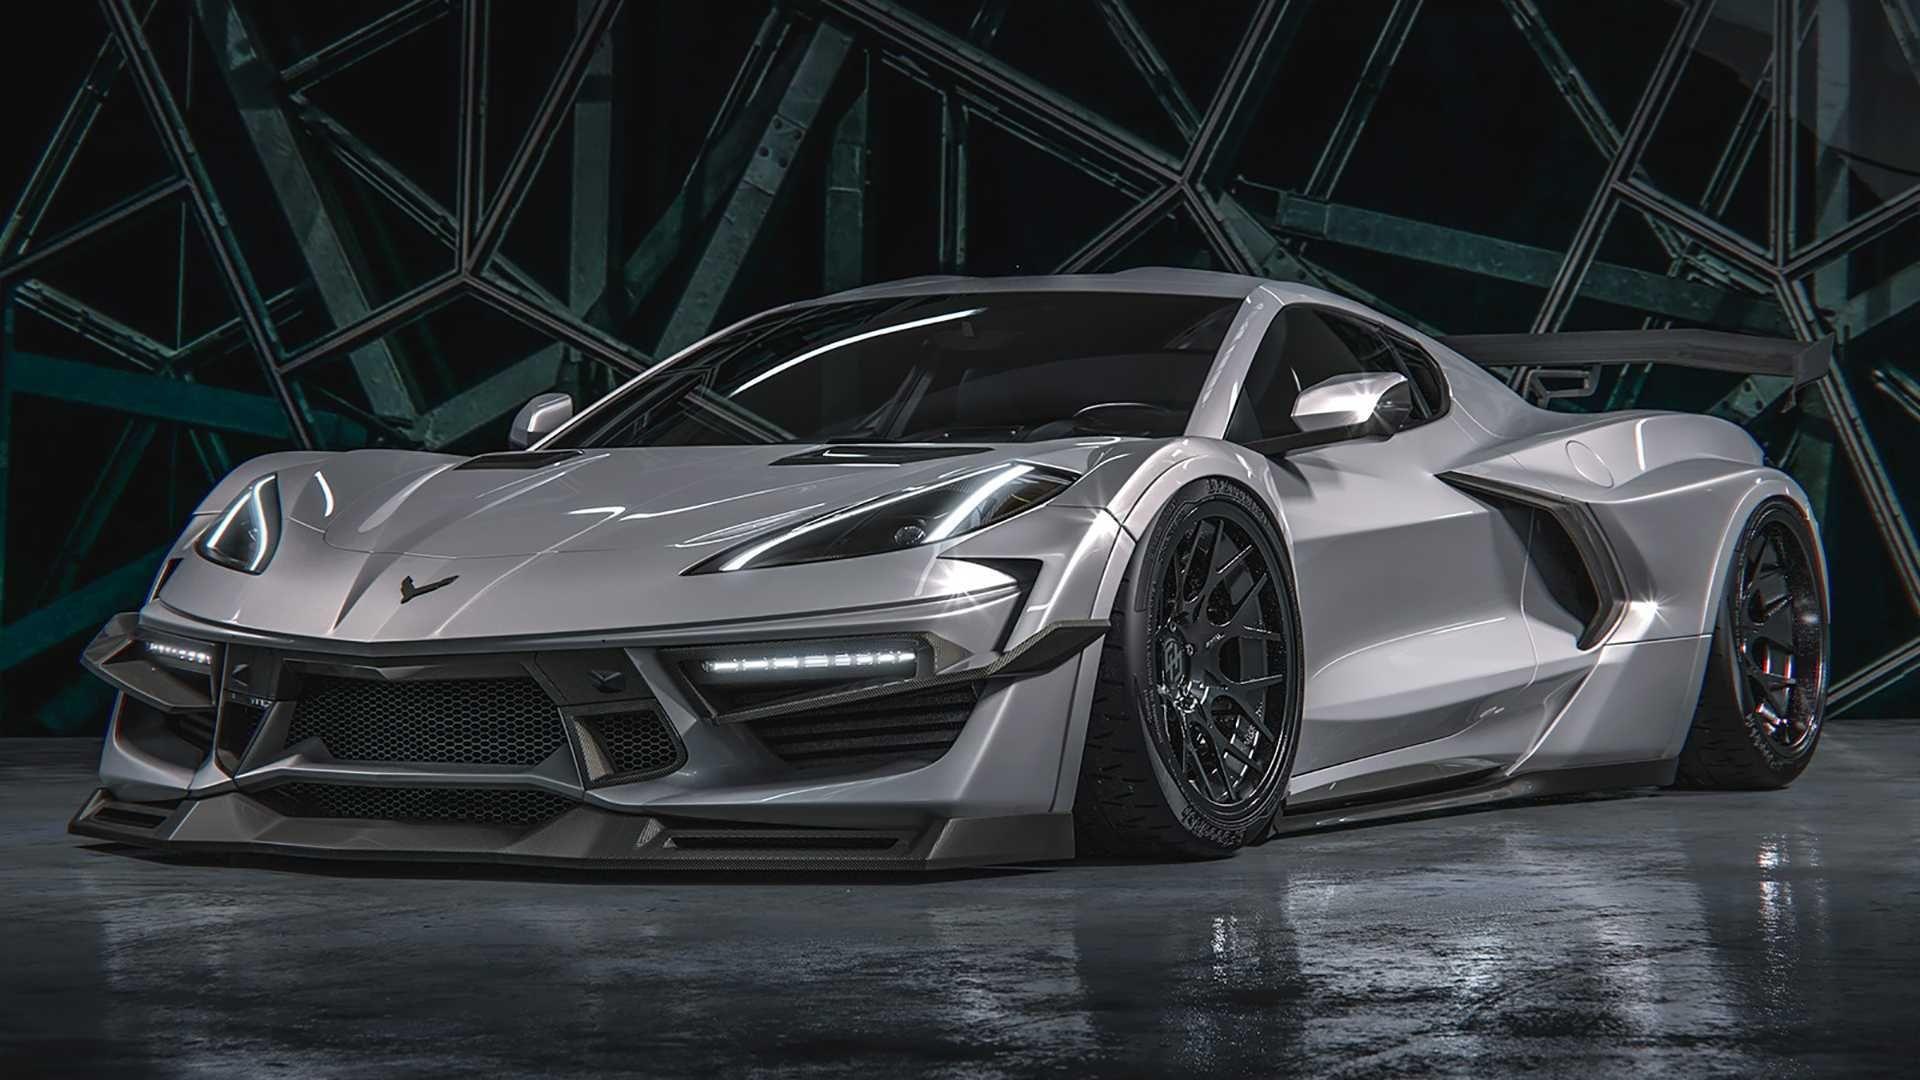 2020 C8 Corvette Widebody Rendering Takes Styling To A Whole New Level Renderingarchitecture Goruntuler Ile Corvette Chevrolet Corvette Chevy